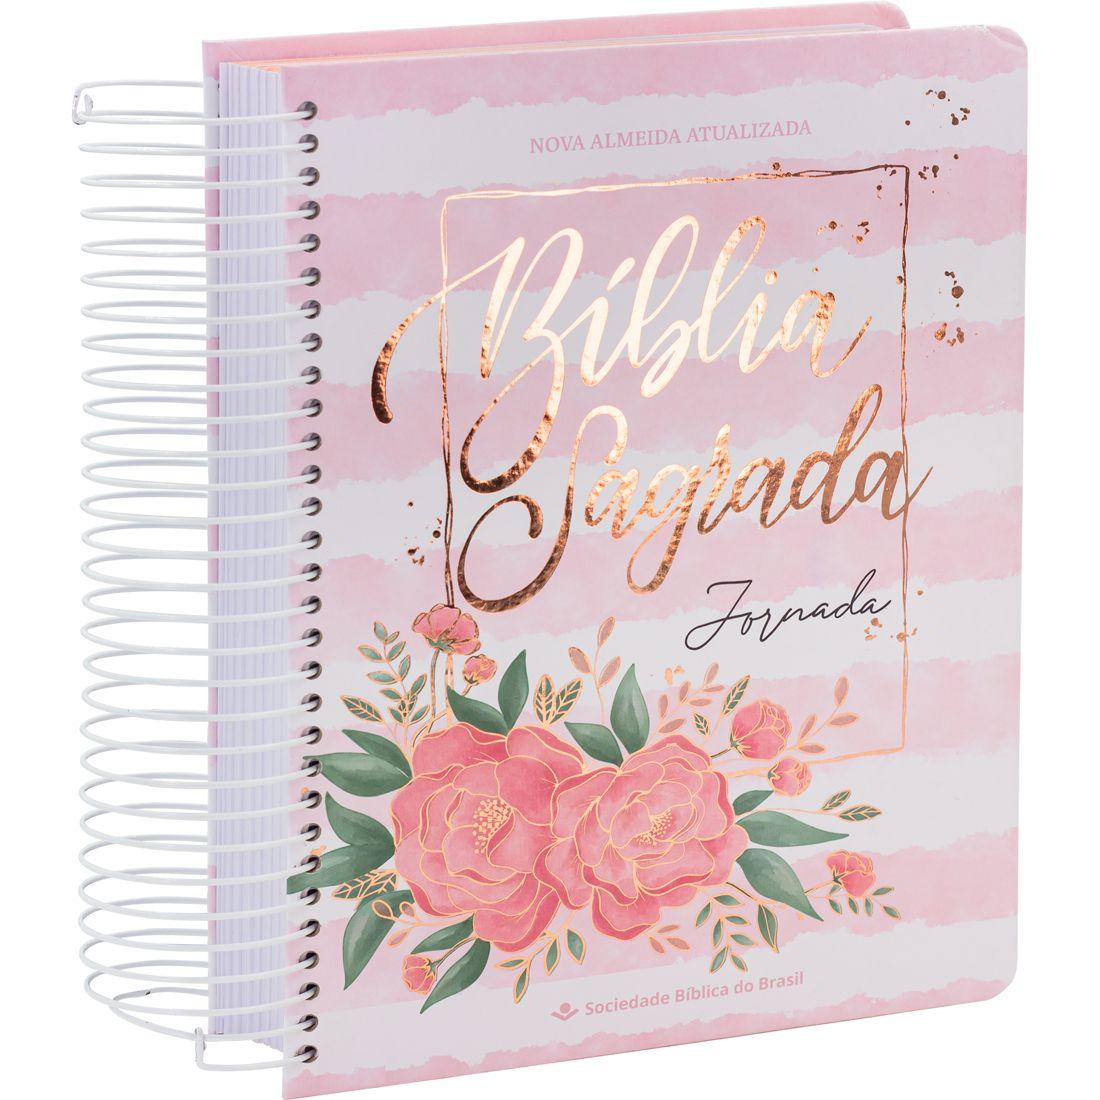 Bíblia Sagrada Jornada - Aquarela Rosa  - Universo Bíblico Rs